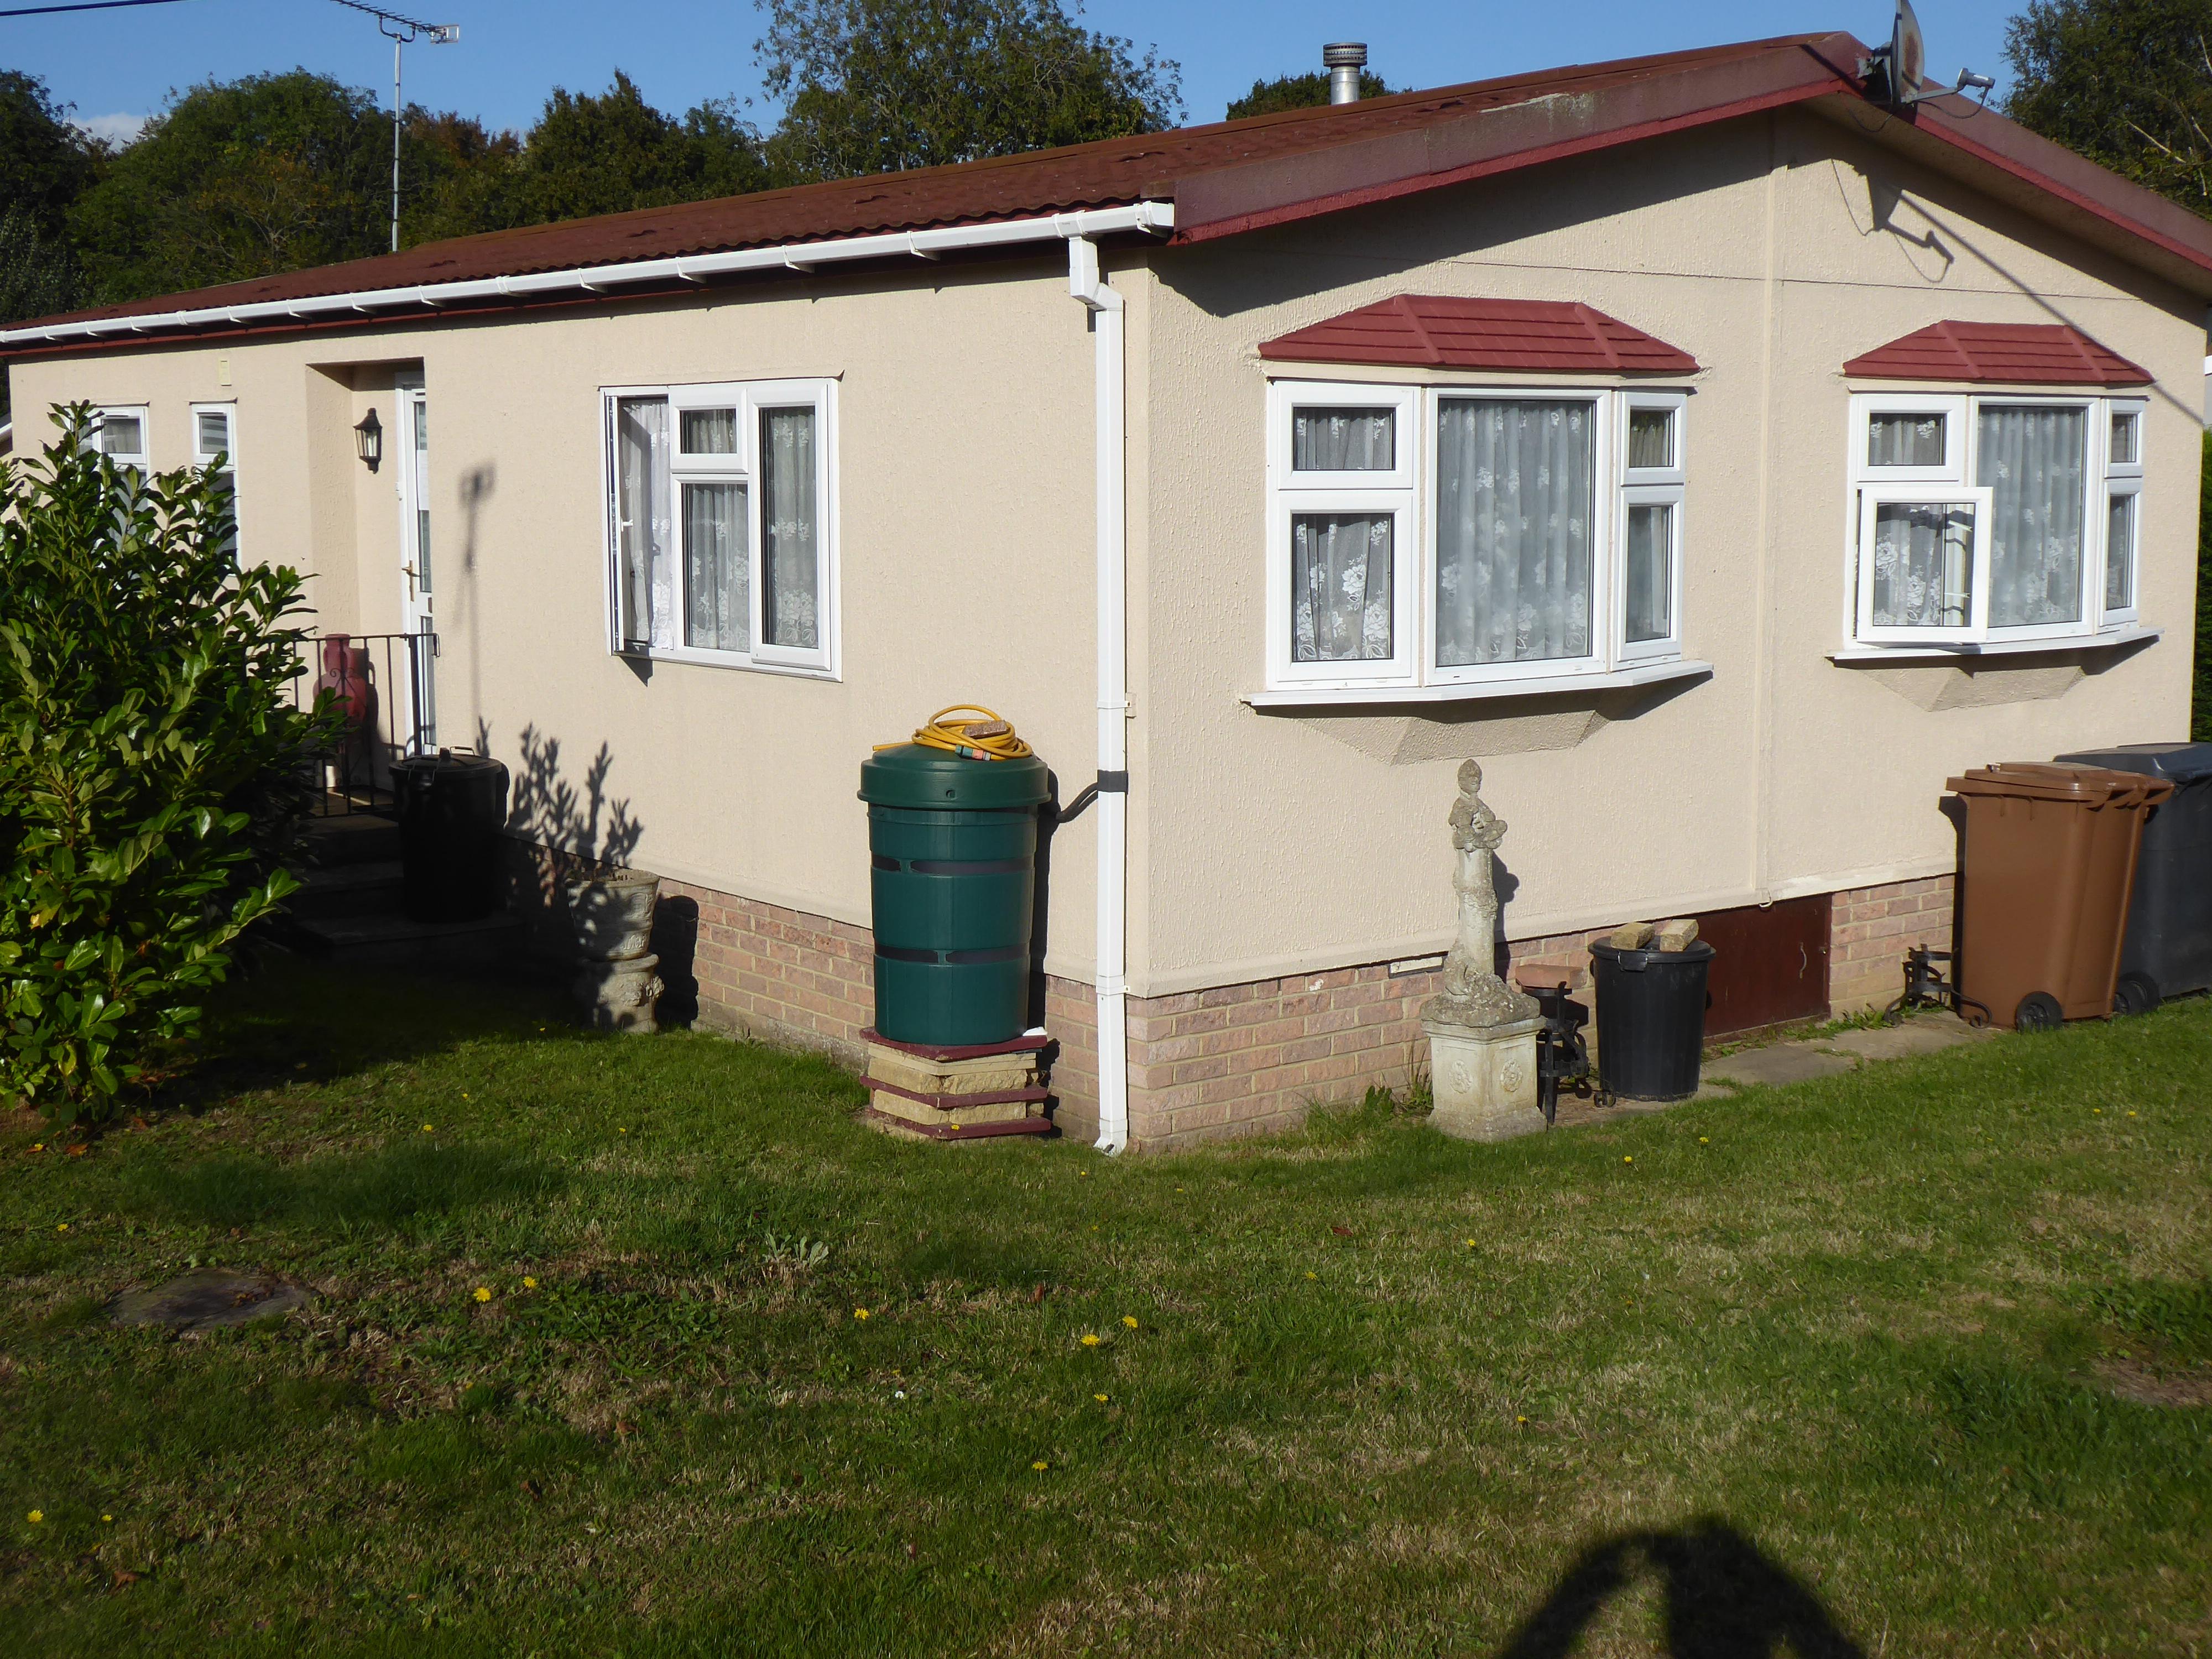 Photo: 2 Bedrooms, Temple Grove Park, Essex